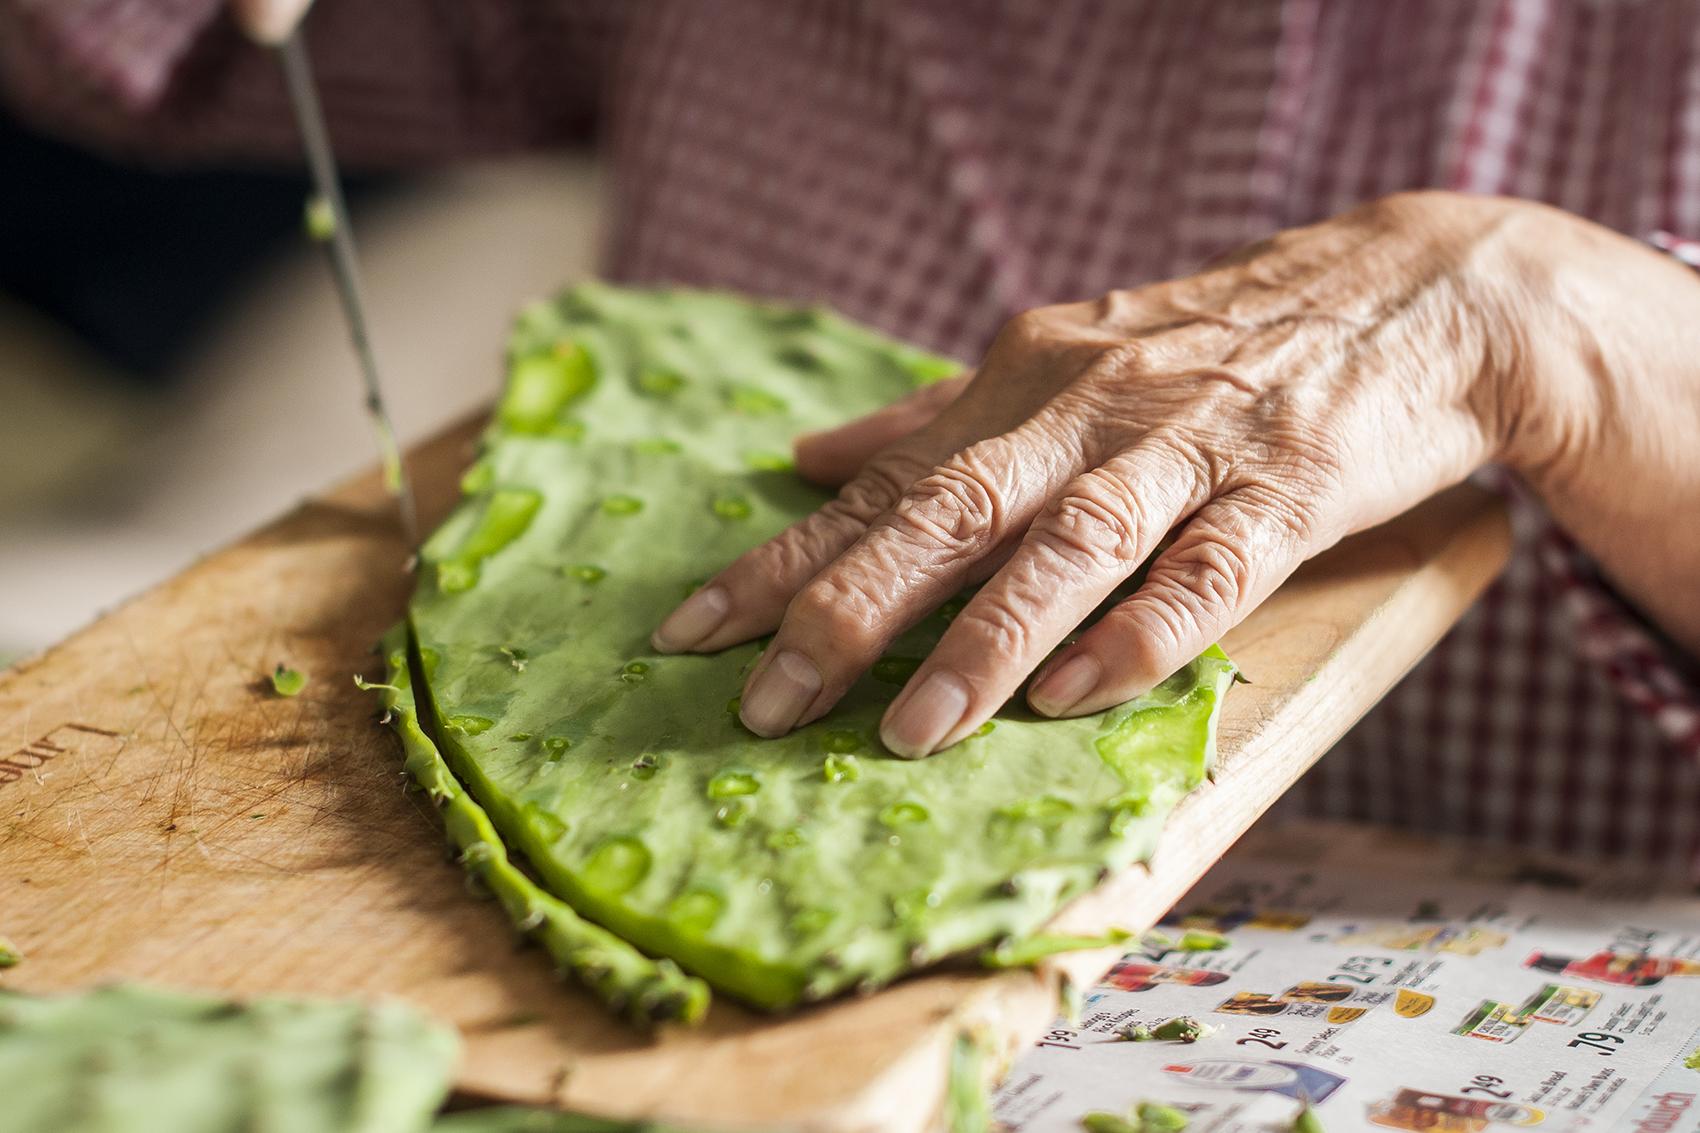 close up photo of a elderly woman's hands preparing nopales